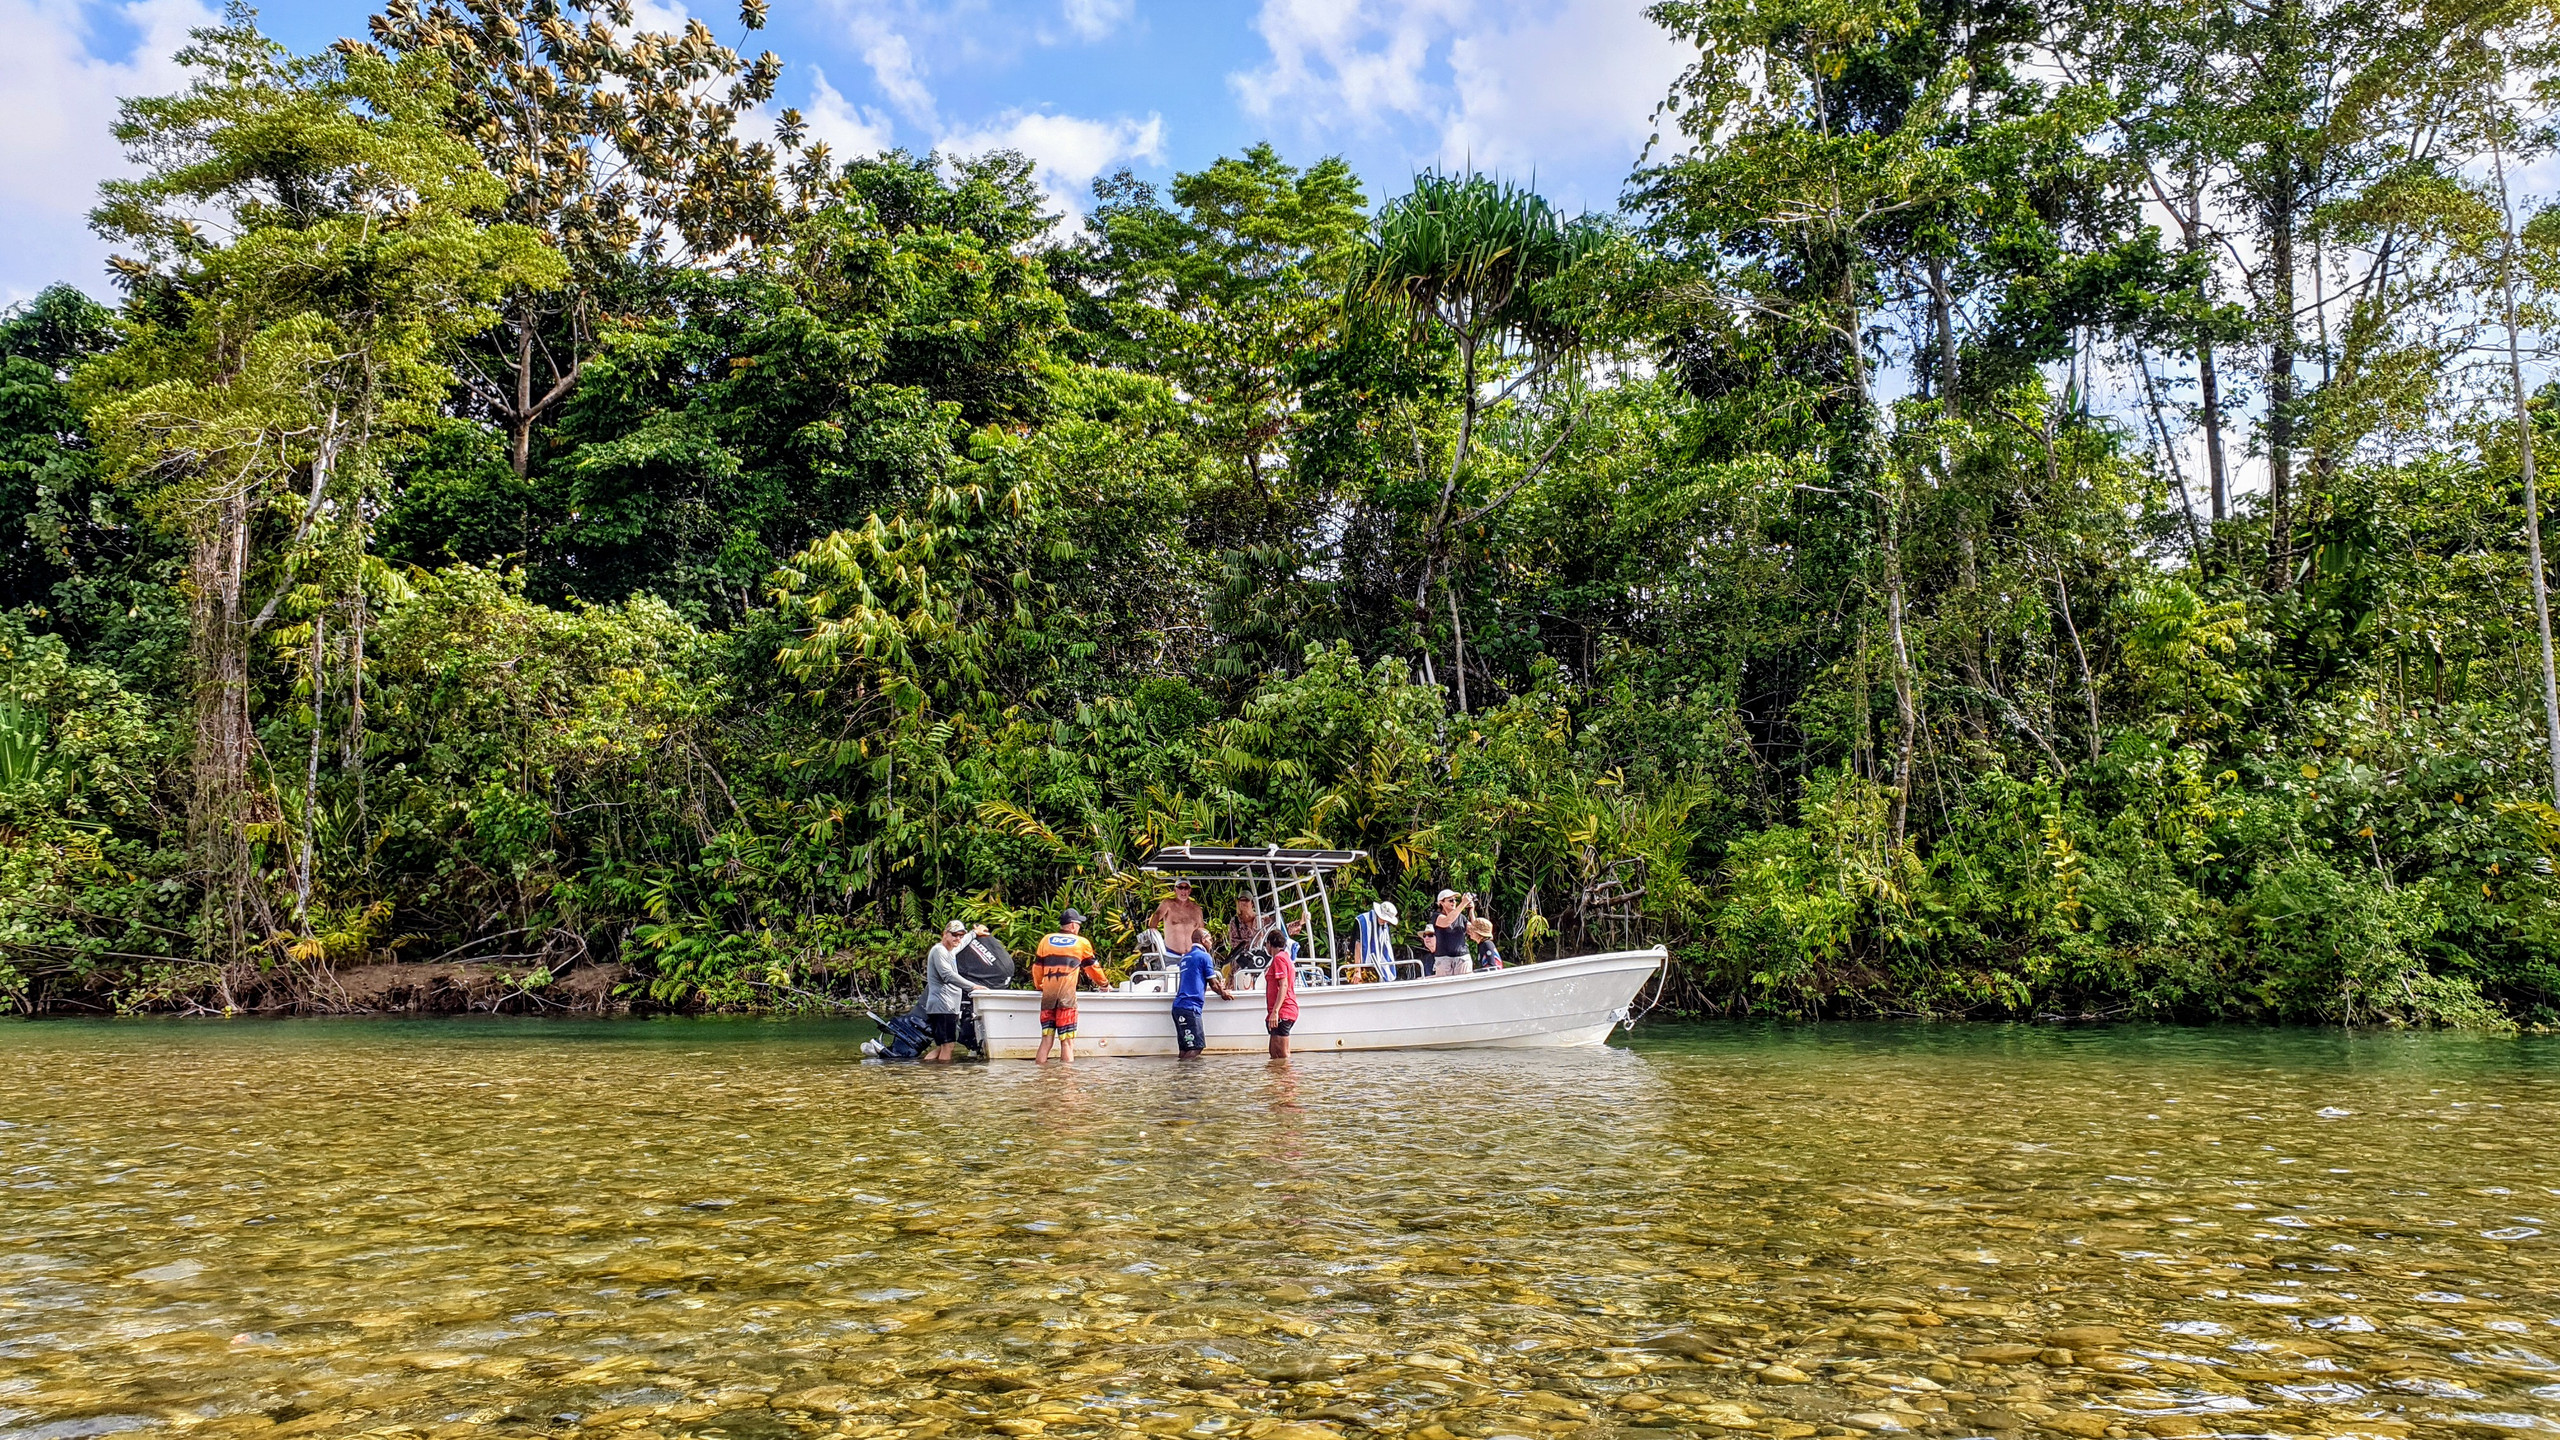 Swimming in River - Baia Sportfishing - Papua New Guinea